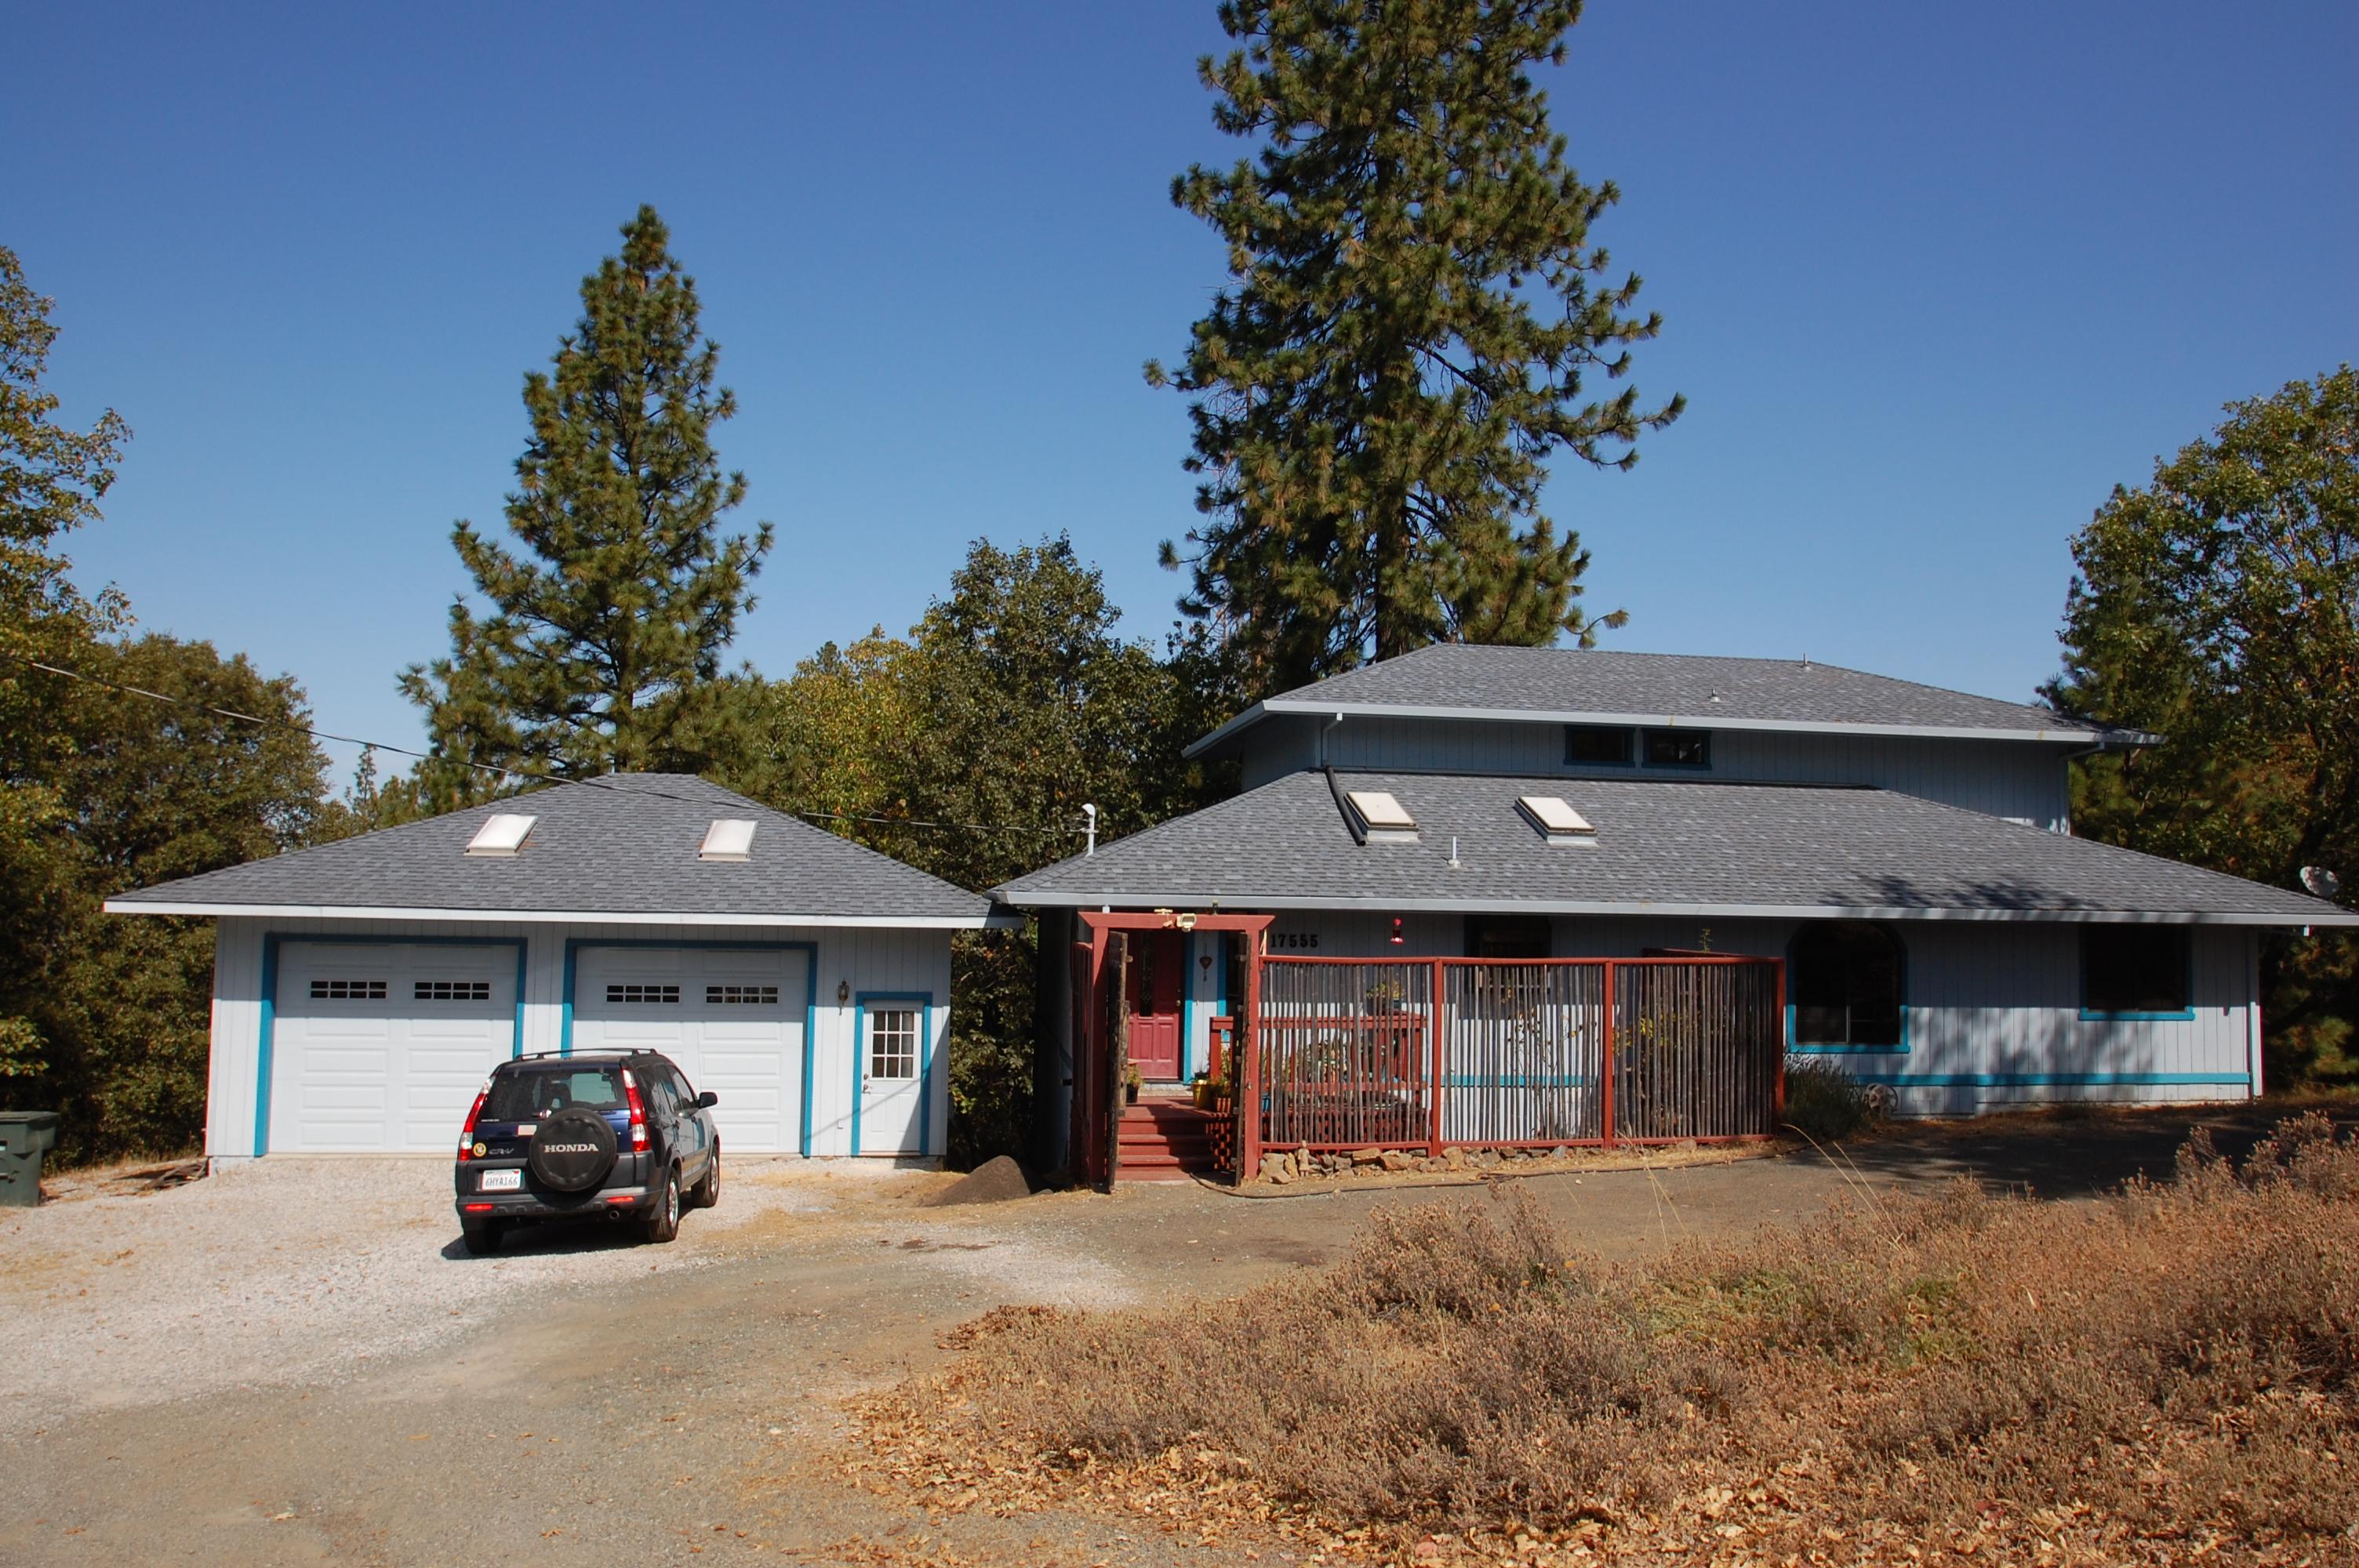 17555 Tanyard Hill West, Pine Grove, California 95665